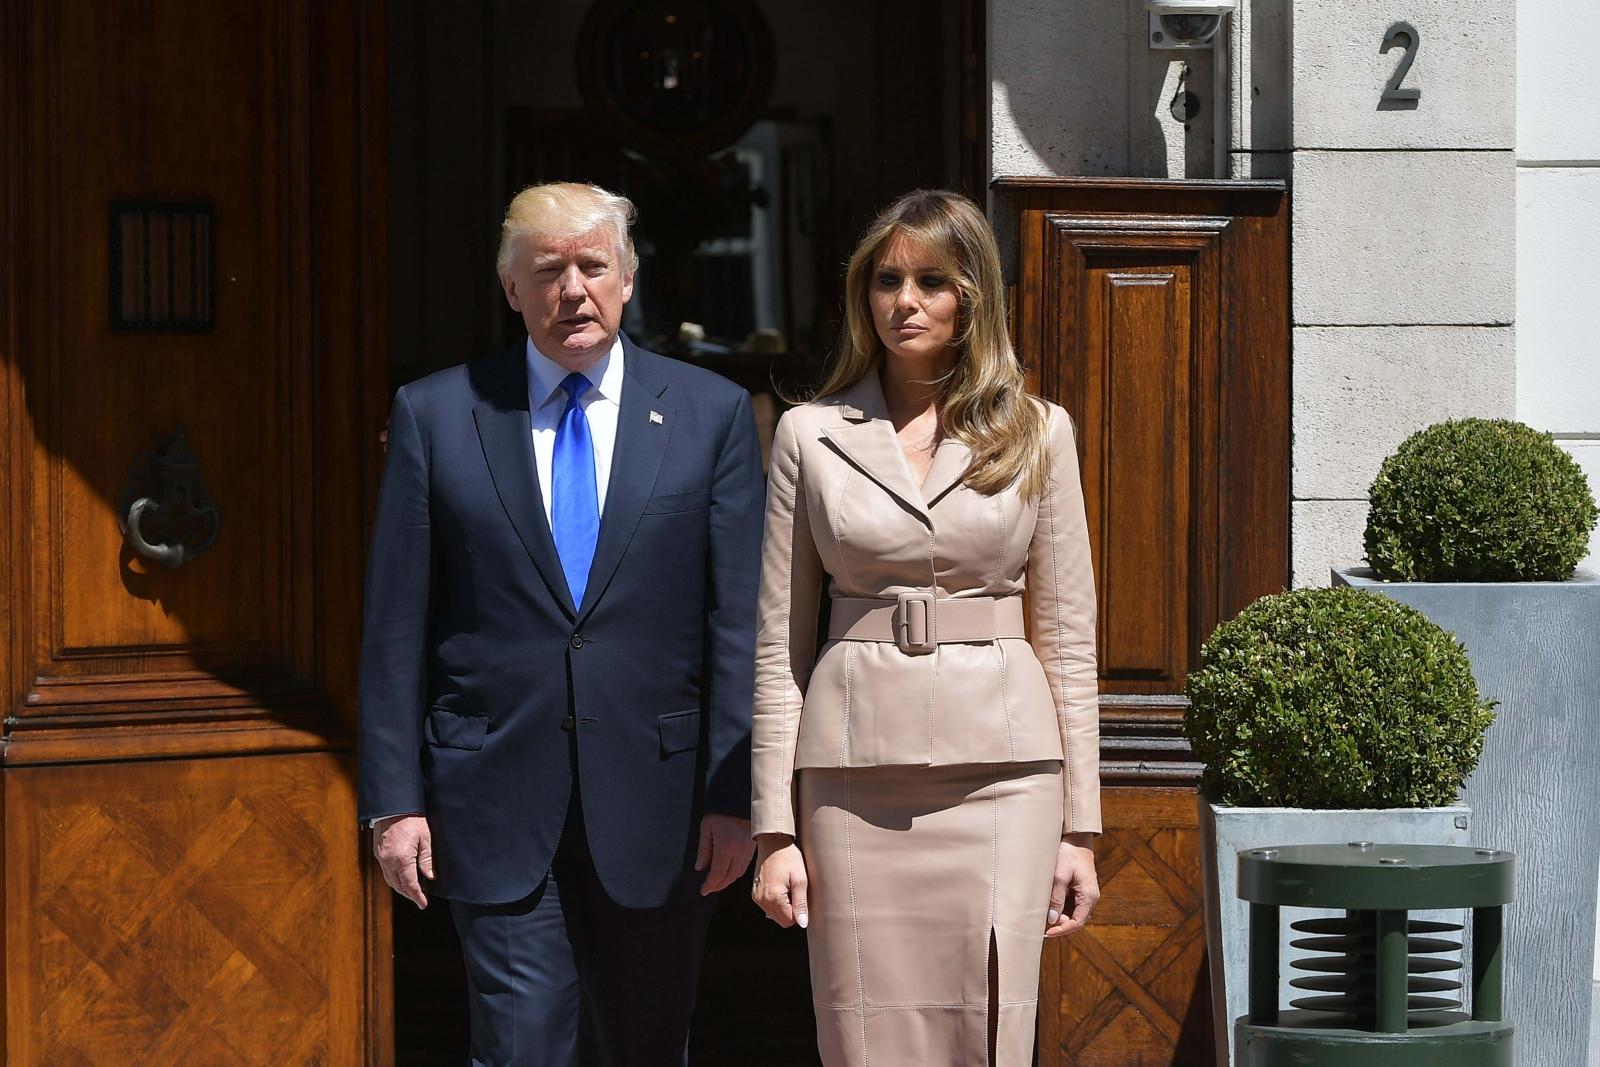 Melania Trump doubts Kathy Griffin's mental health and slams Trump ...